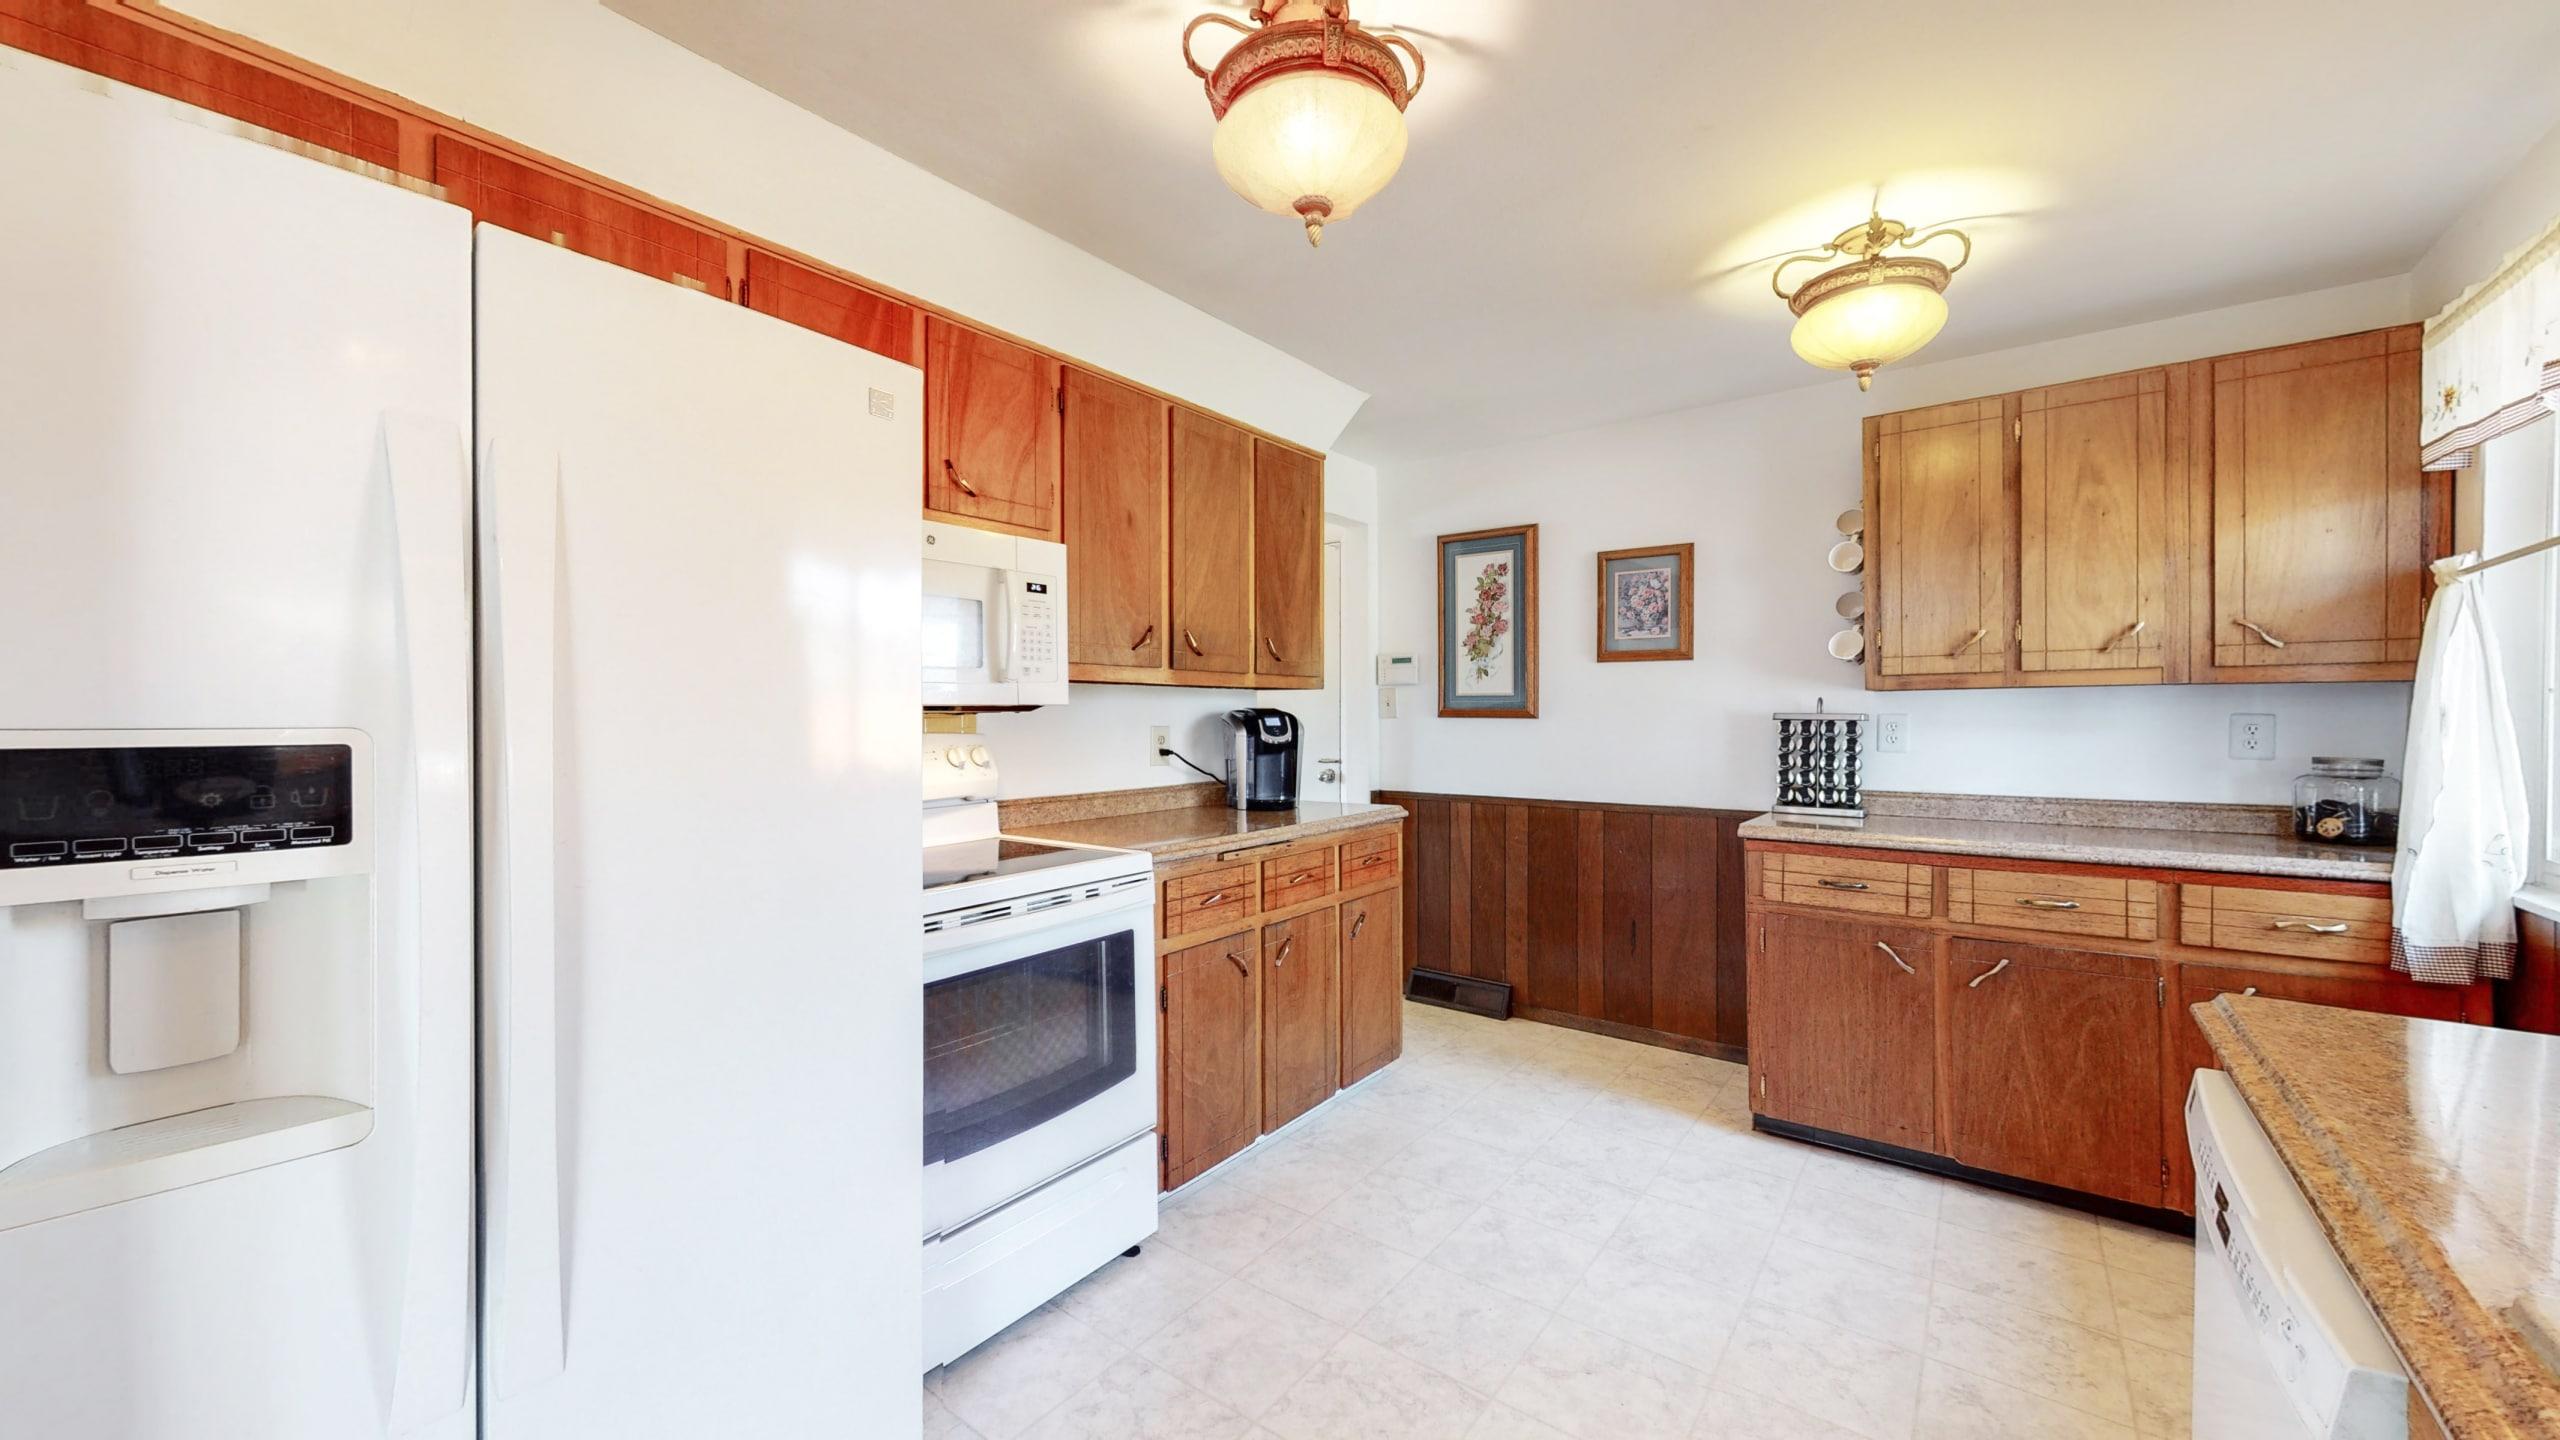 Arvada Home For Sale Rustic Wood Cabinets Linoleum Floors